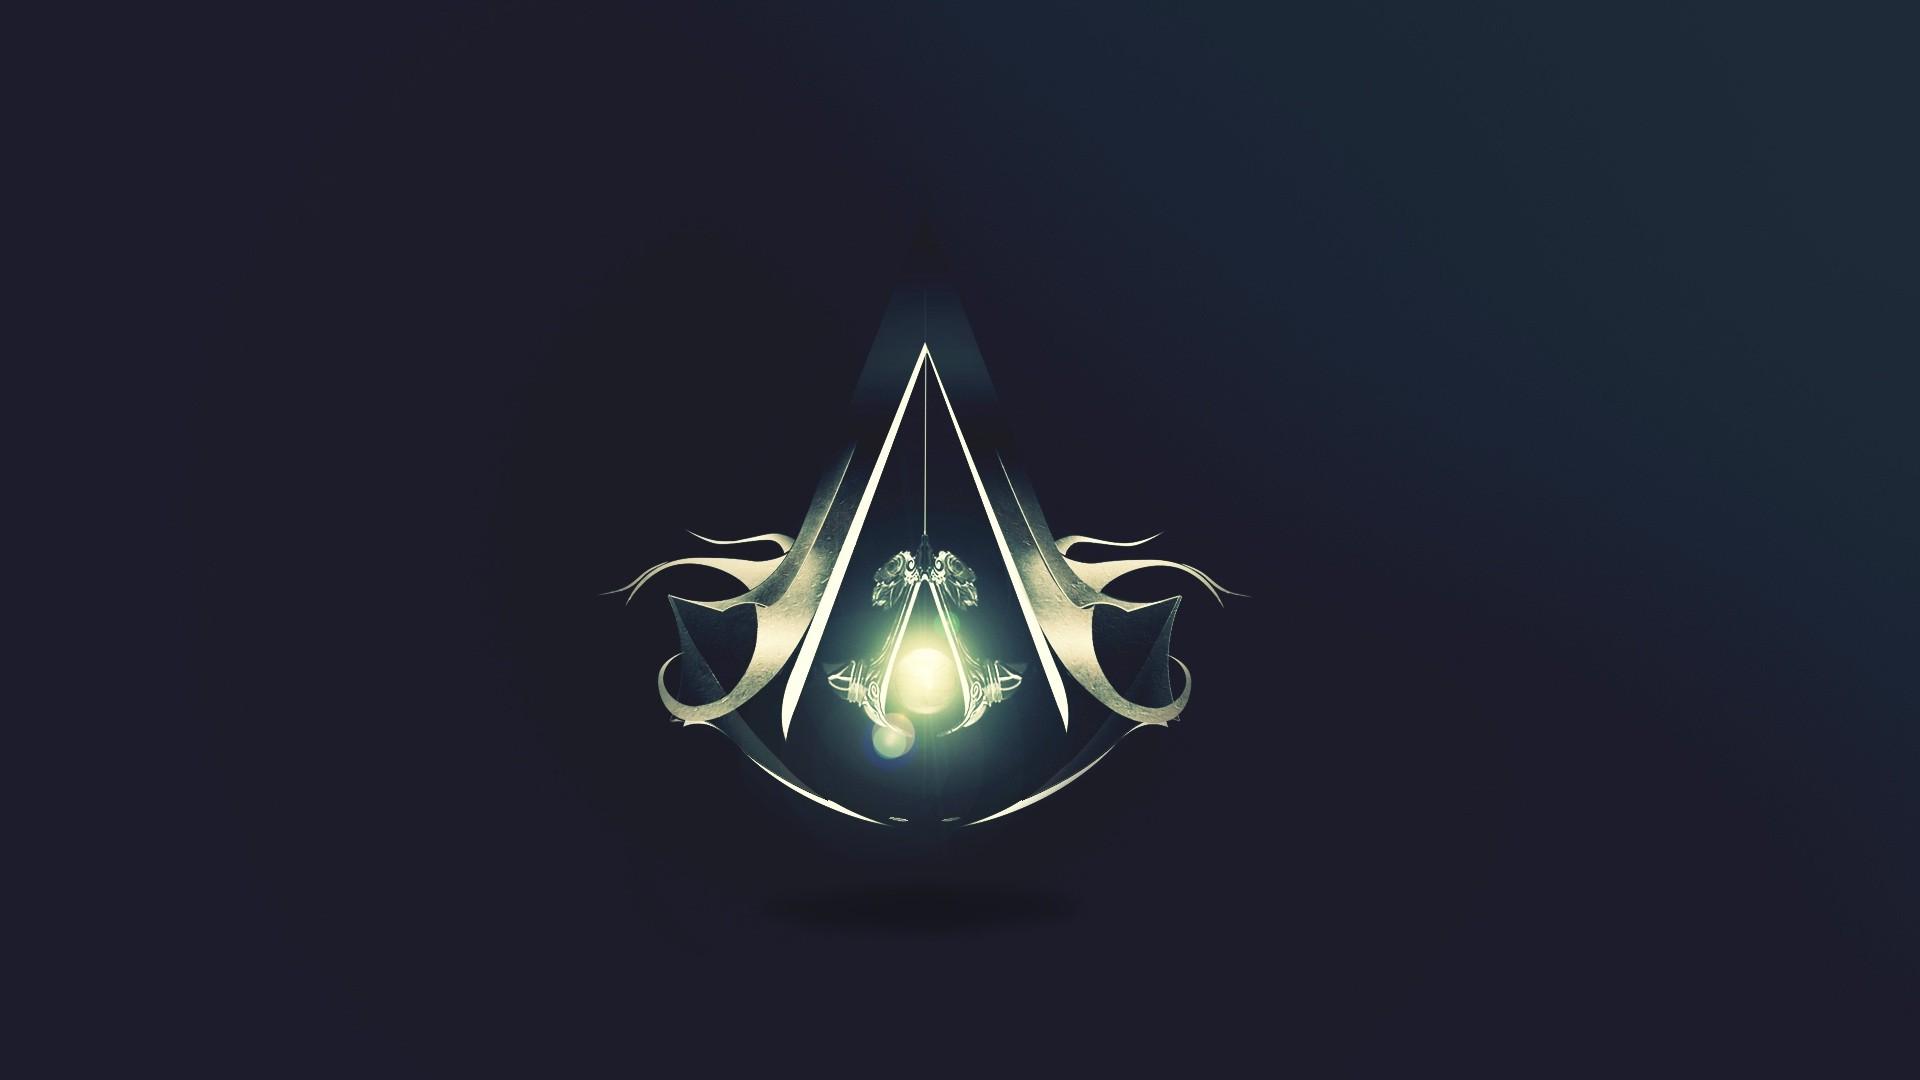 Wallpaper Illustration Video Games Reflection Logo Circle